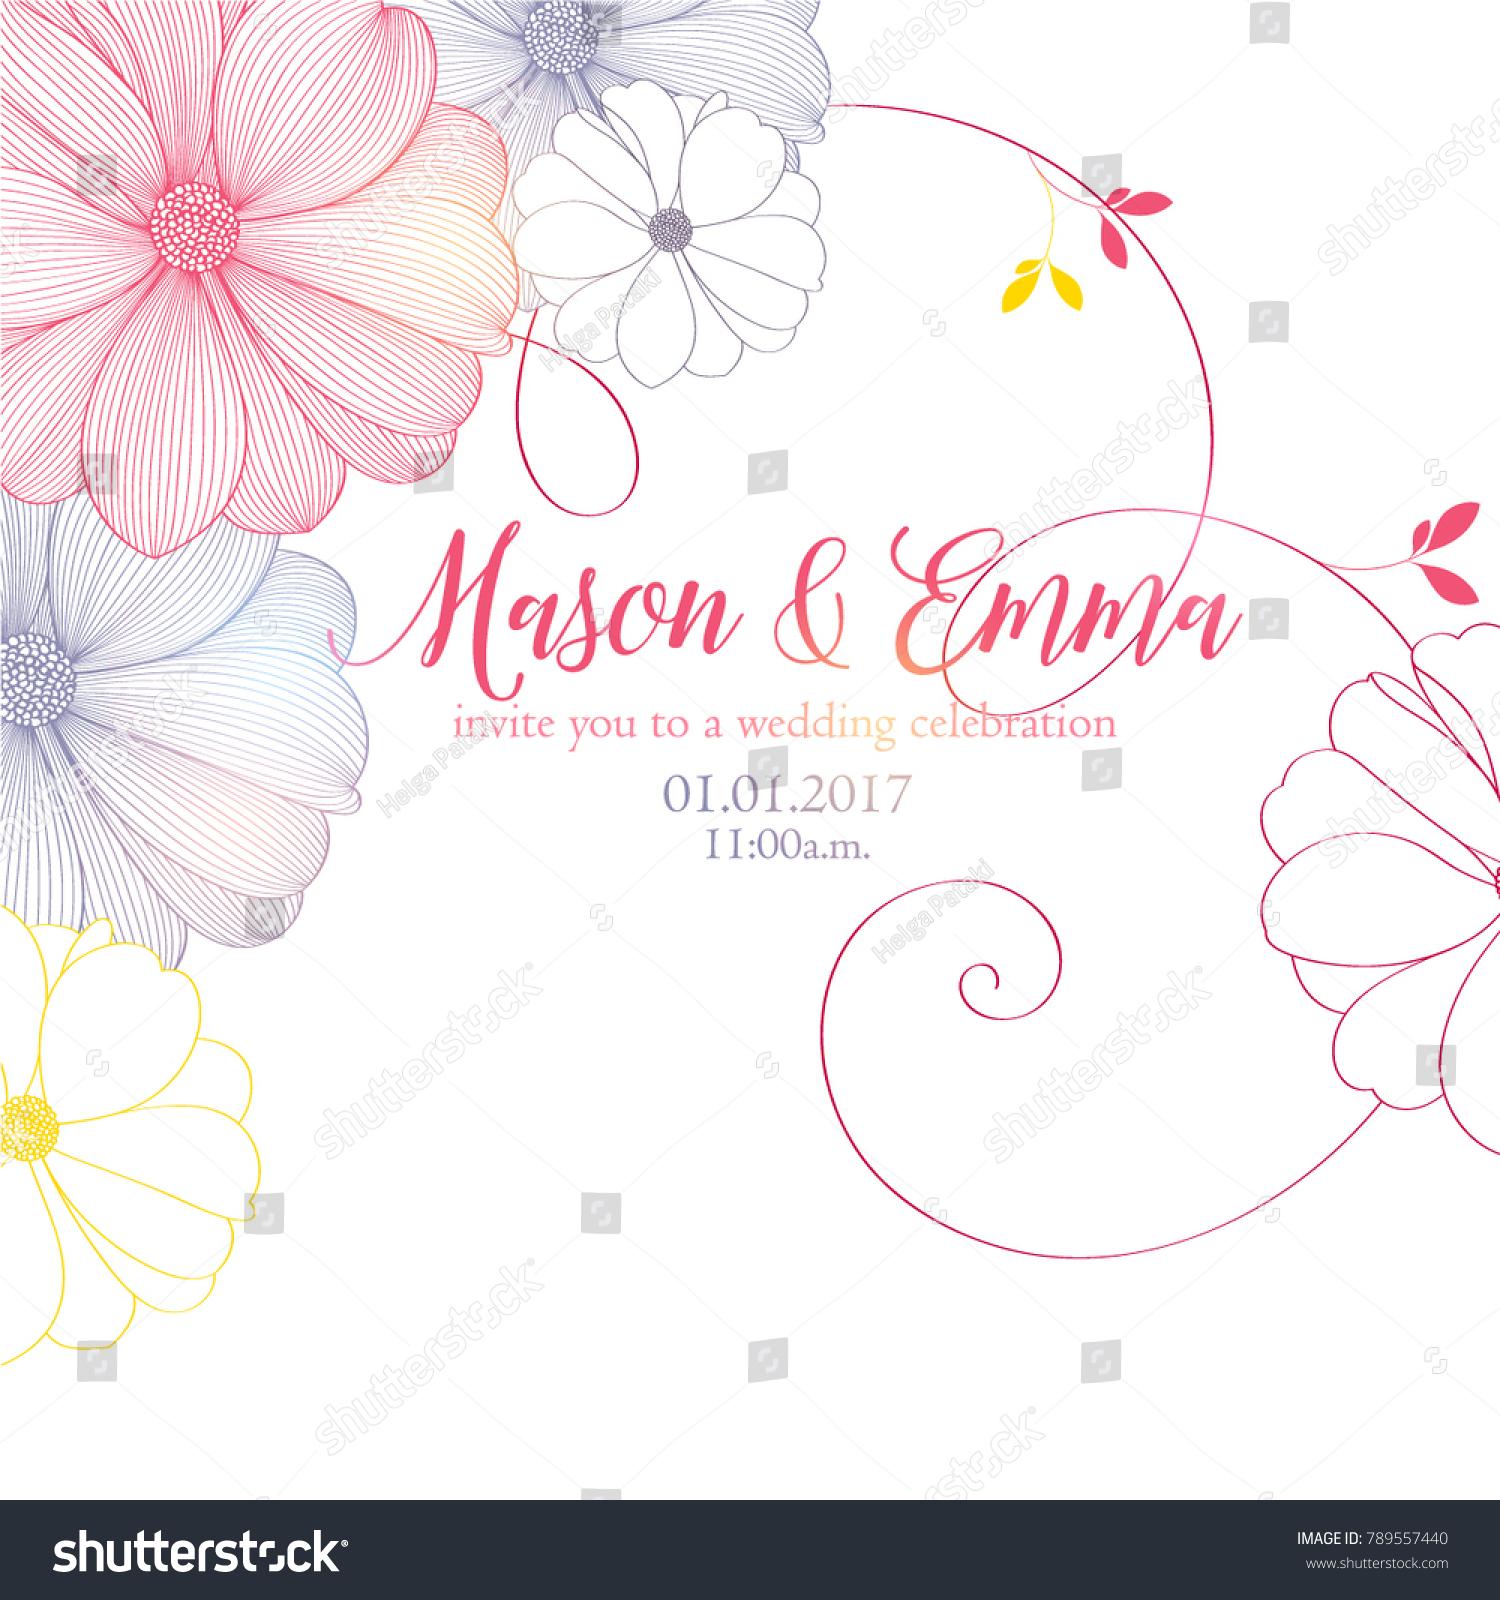 Cute Wedding Invitation Flowers Dahlias Congratulations Stock Vector ...